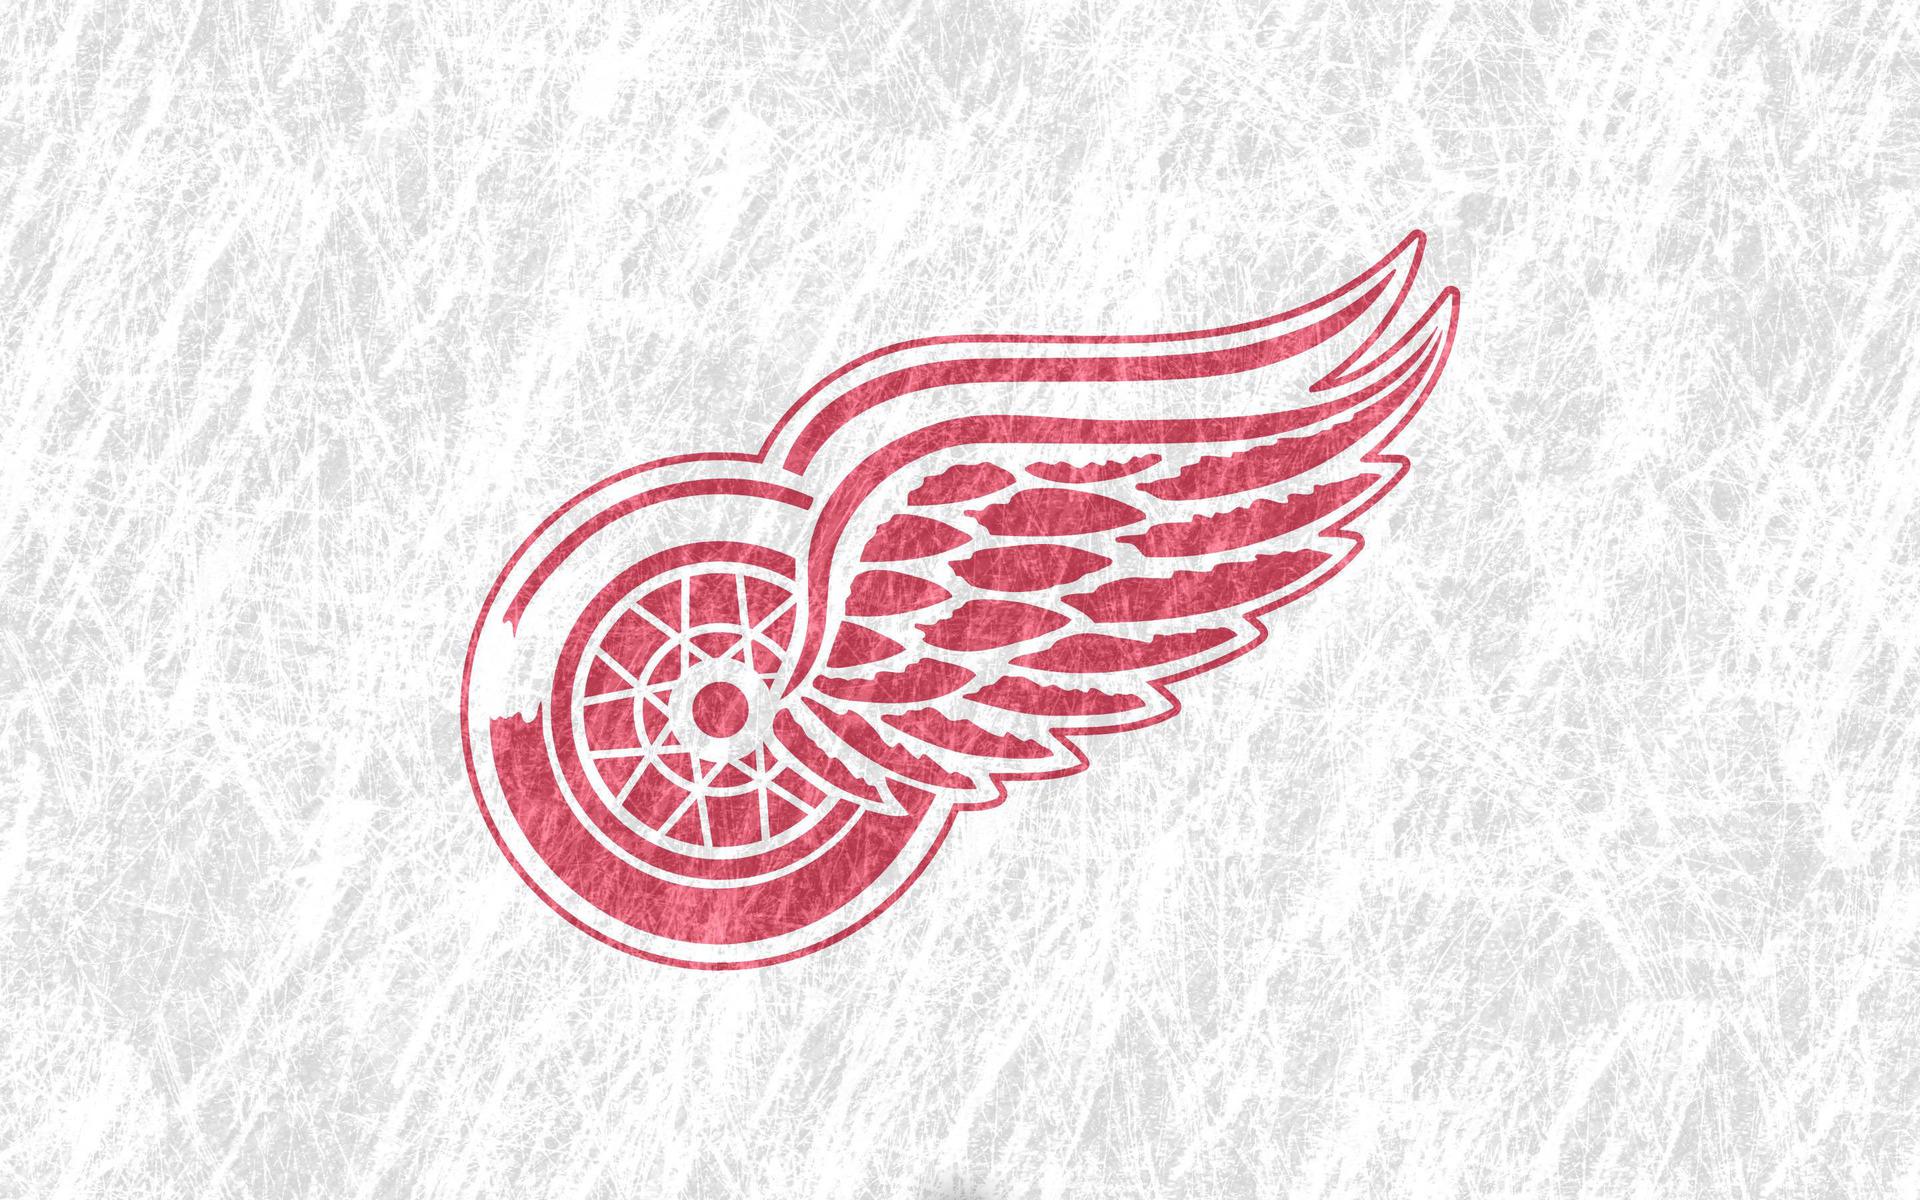 Download Detroit Red Wings wallpaper 1920x1200